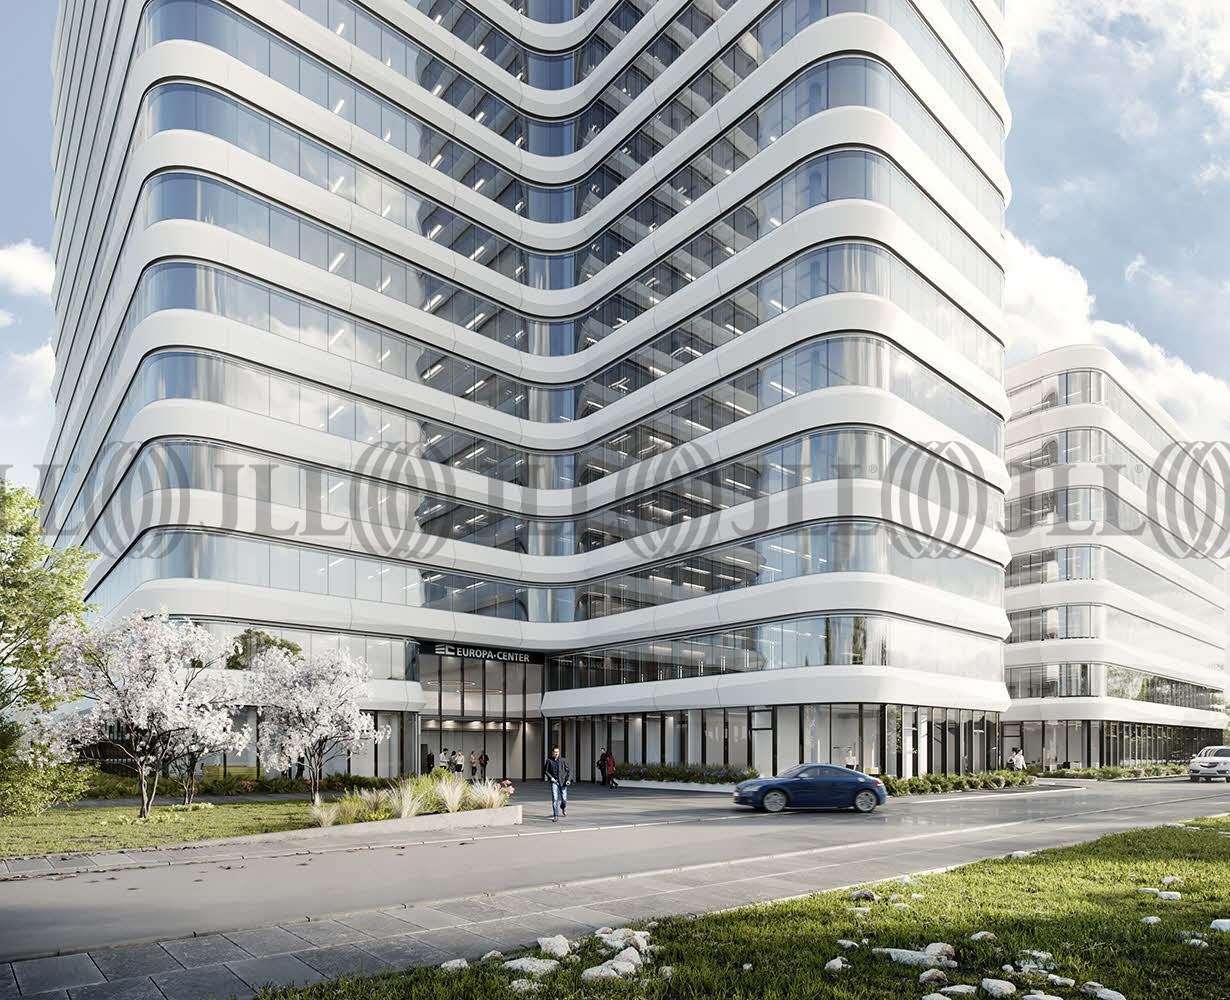 Büros Frankfurt am main, 60549 - Büro - Frankfurt am Main, Flughafen - F2726 - 10915215